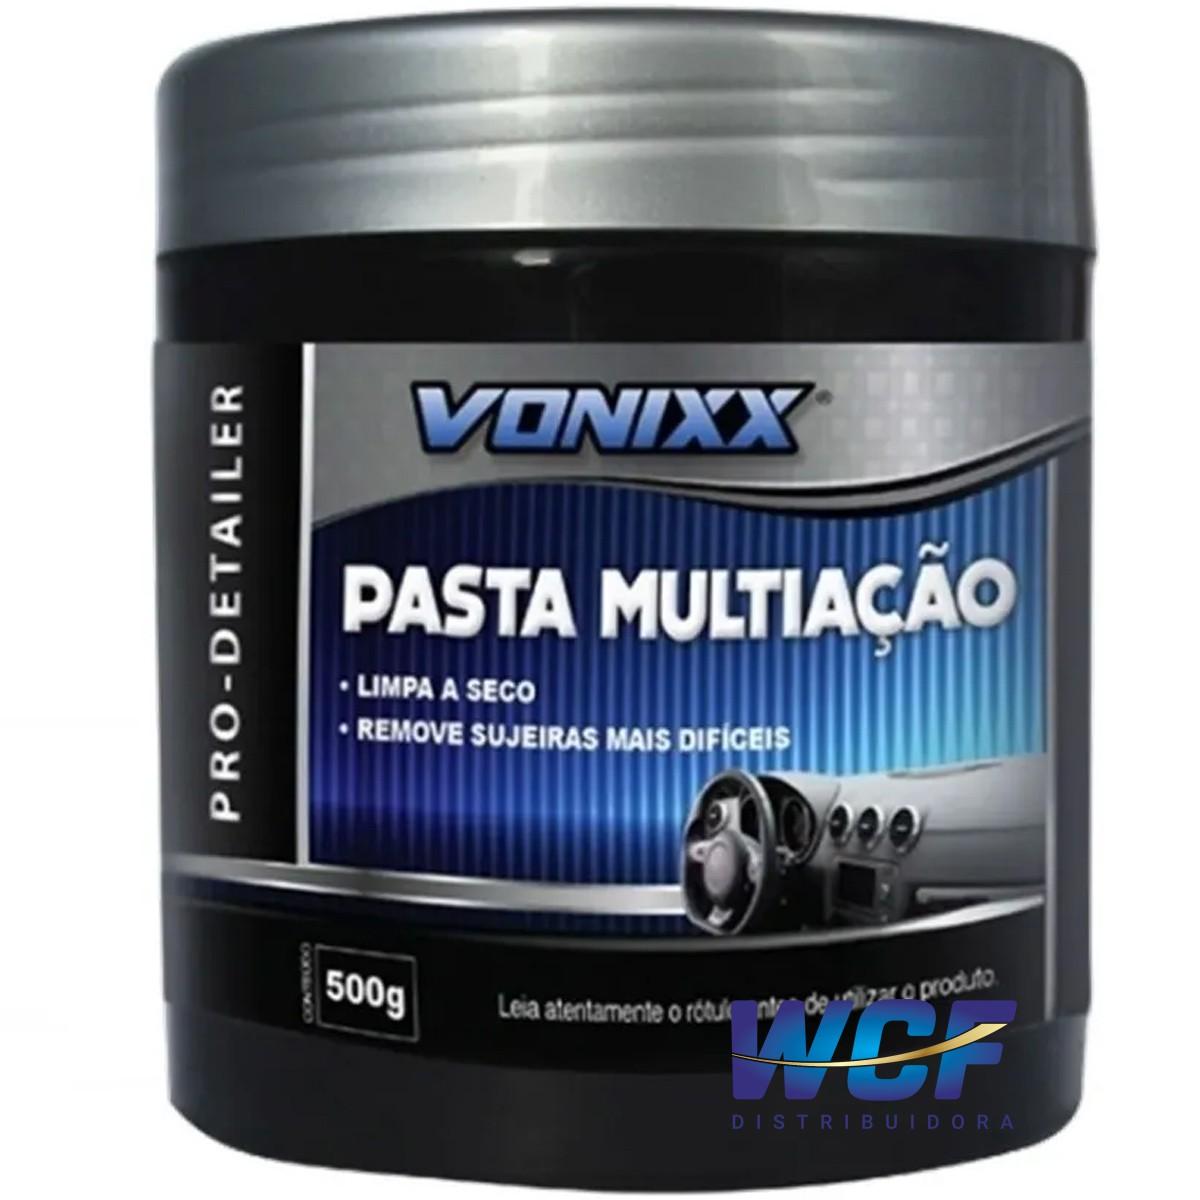 VONIXX PASTA MULTIACAO 500 GRAMAS